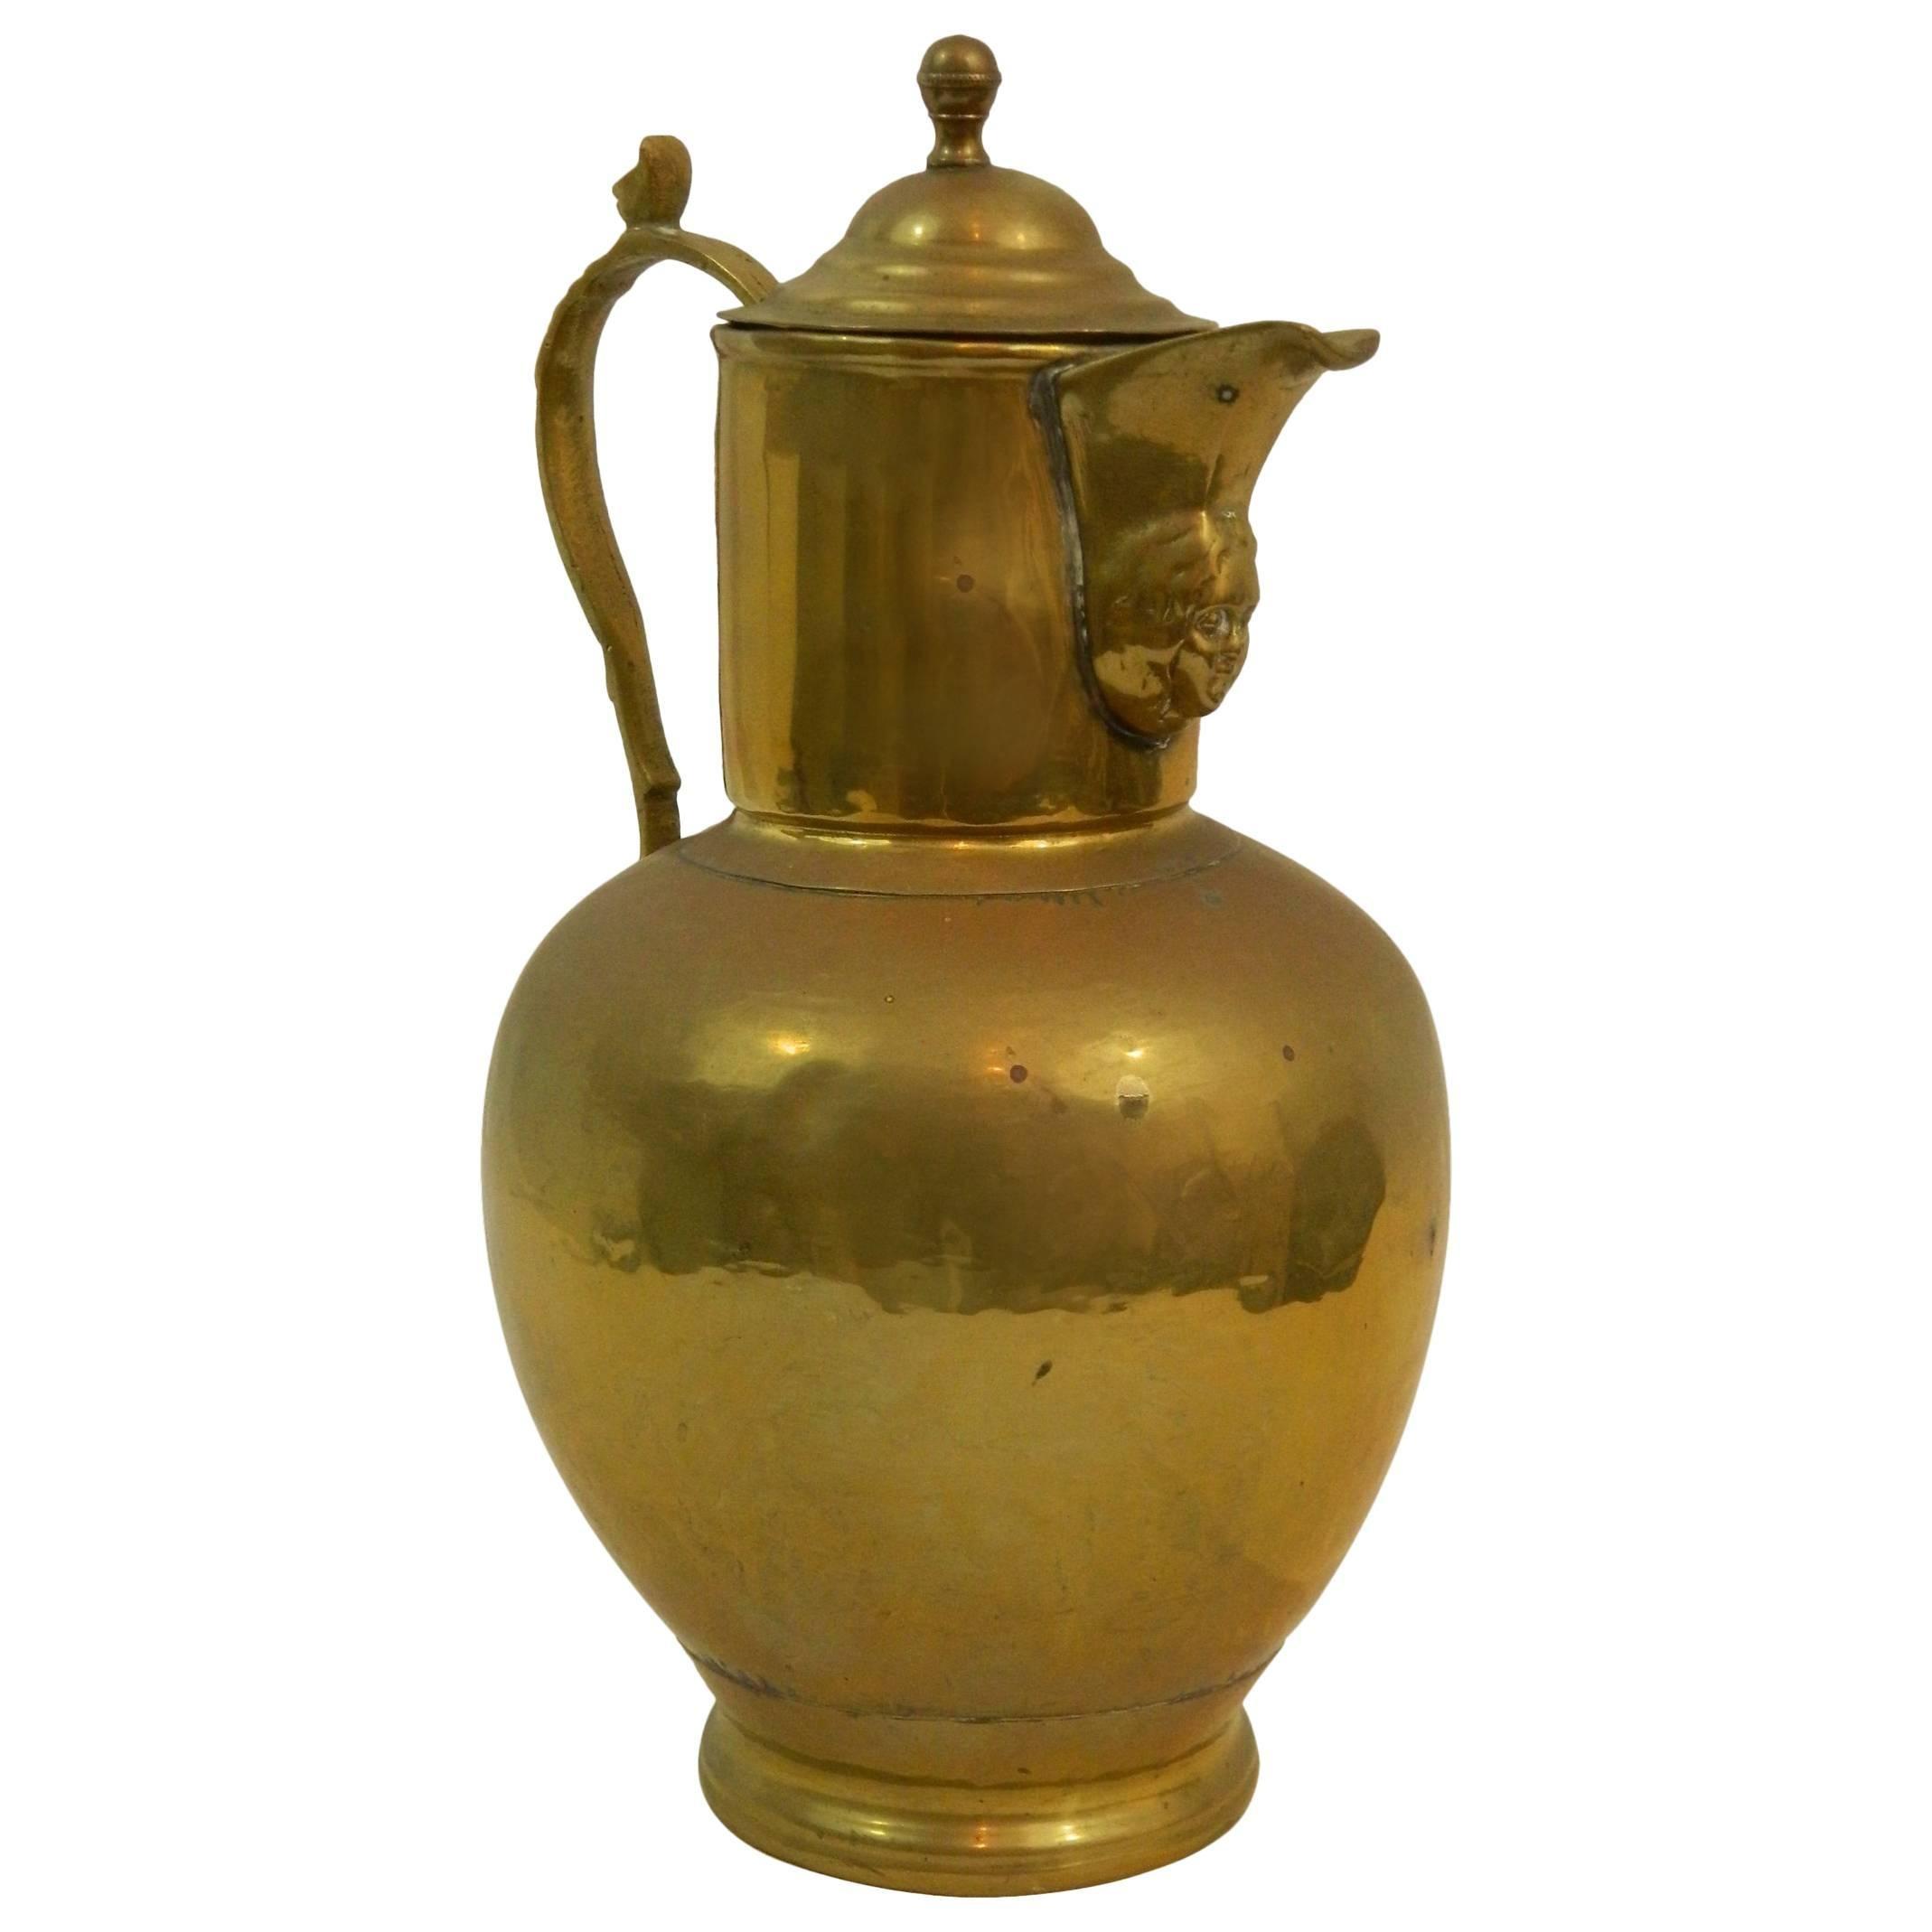 English Brass Wine Jug or Pitcher, 19th Century